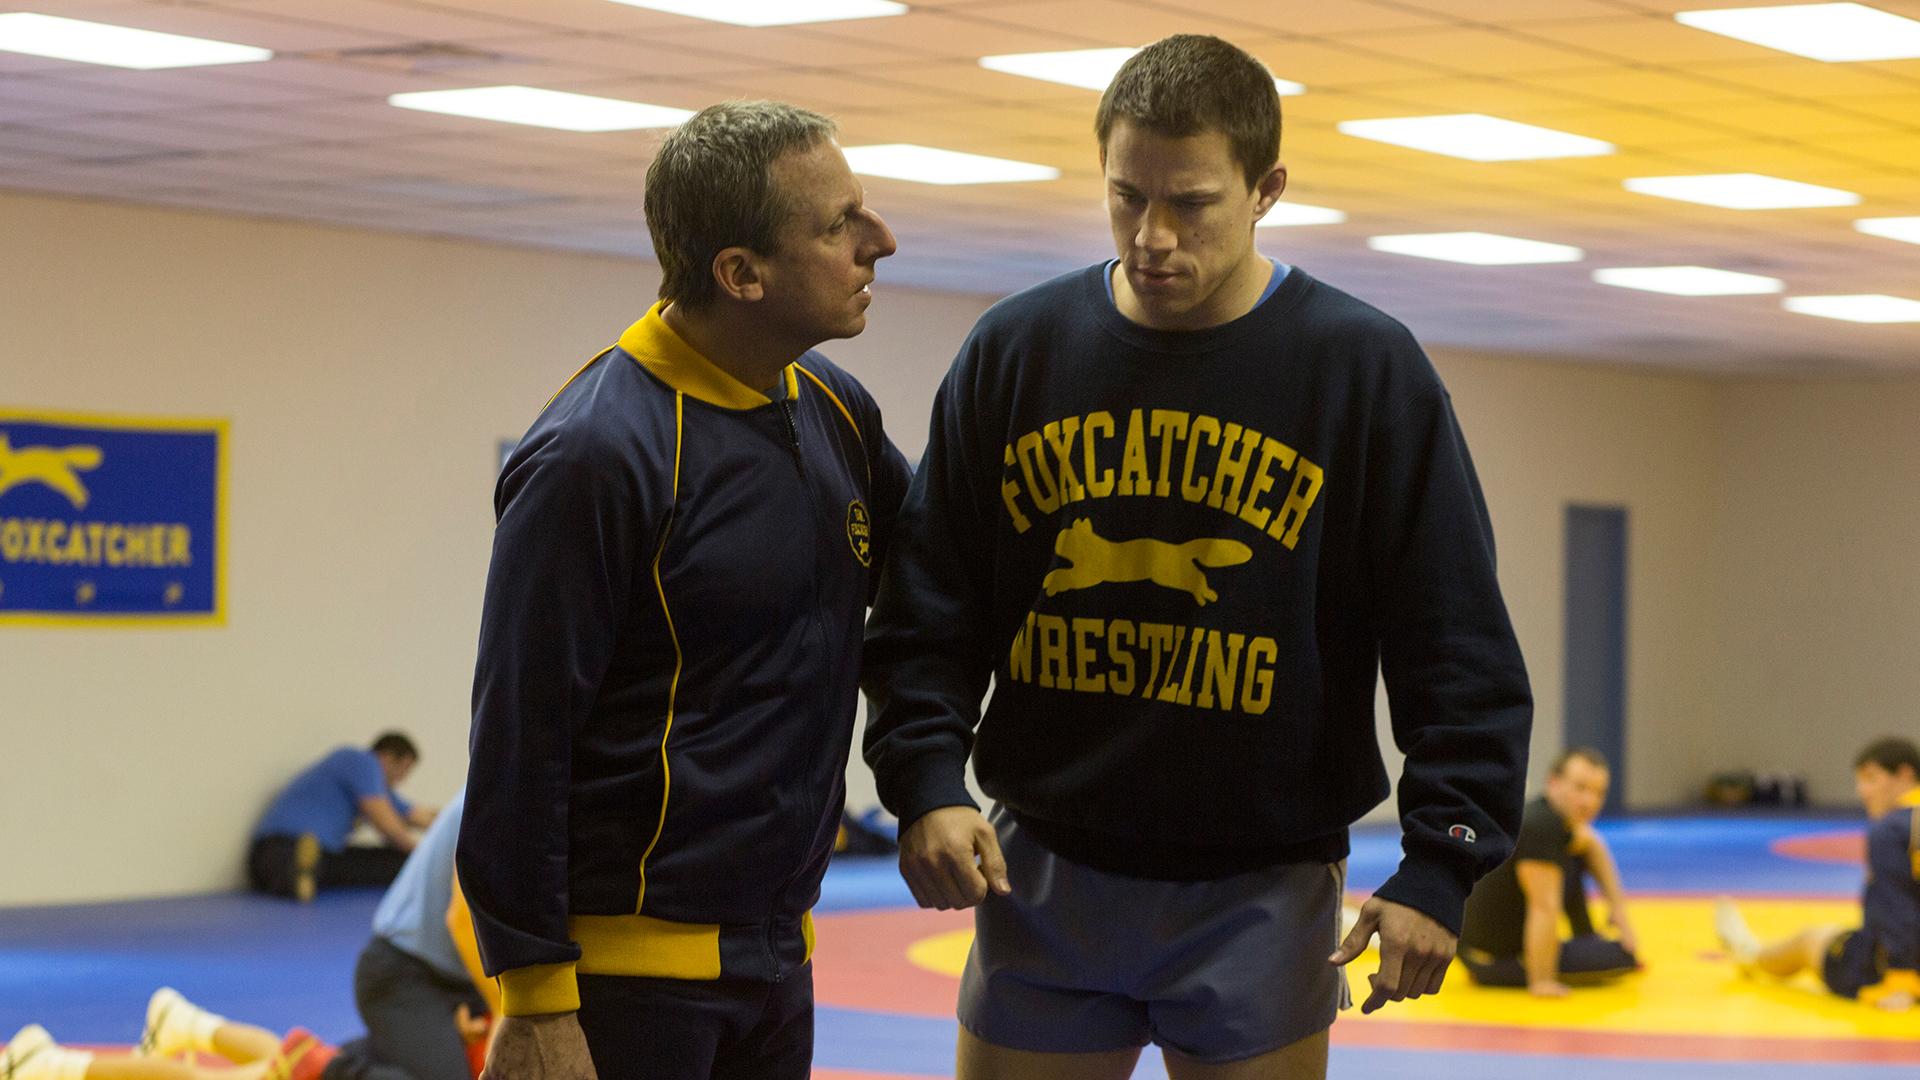 Foxcatcher Movie Review - Steve Carell, Channing Tatum, Mark Ruffalo